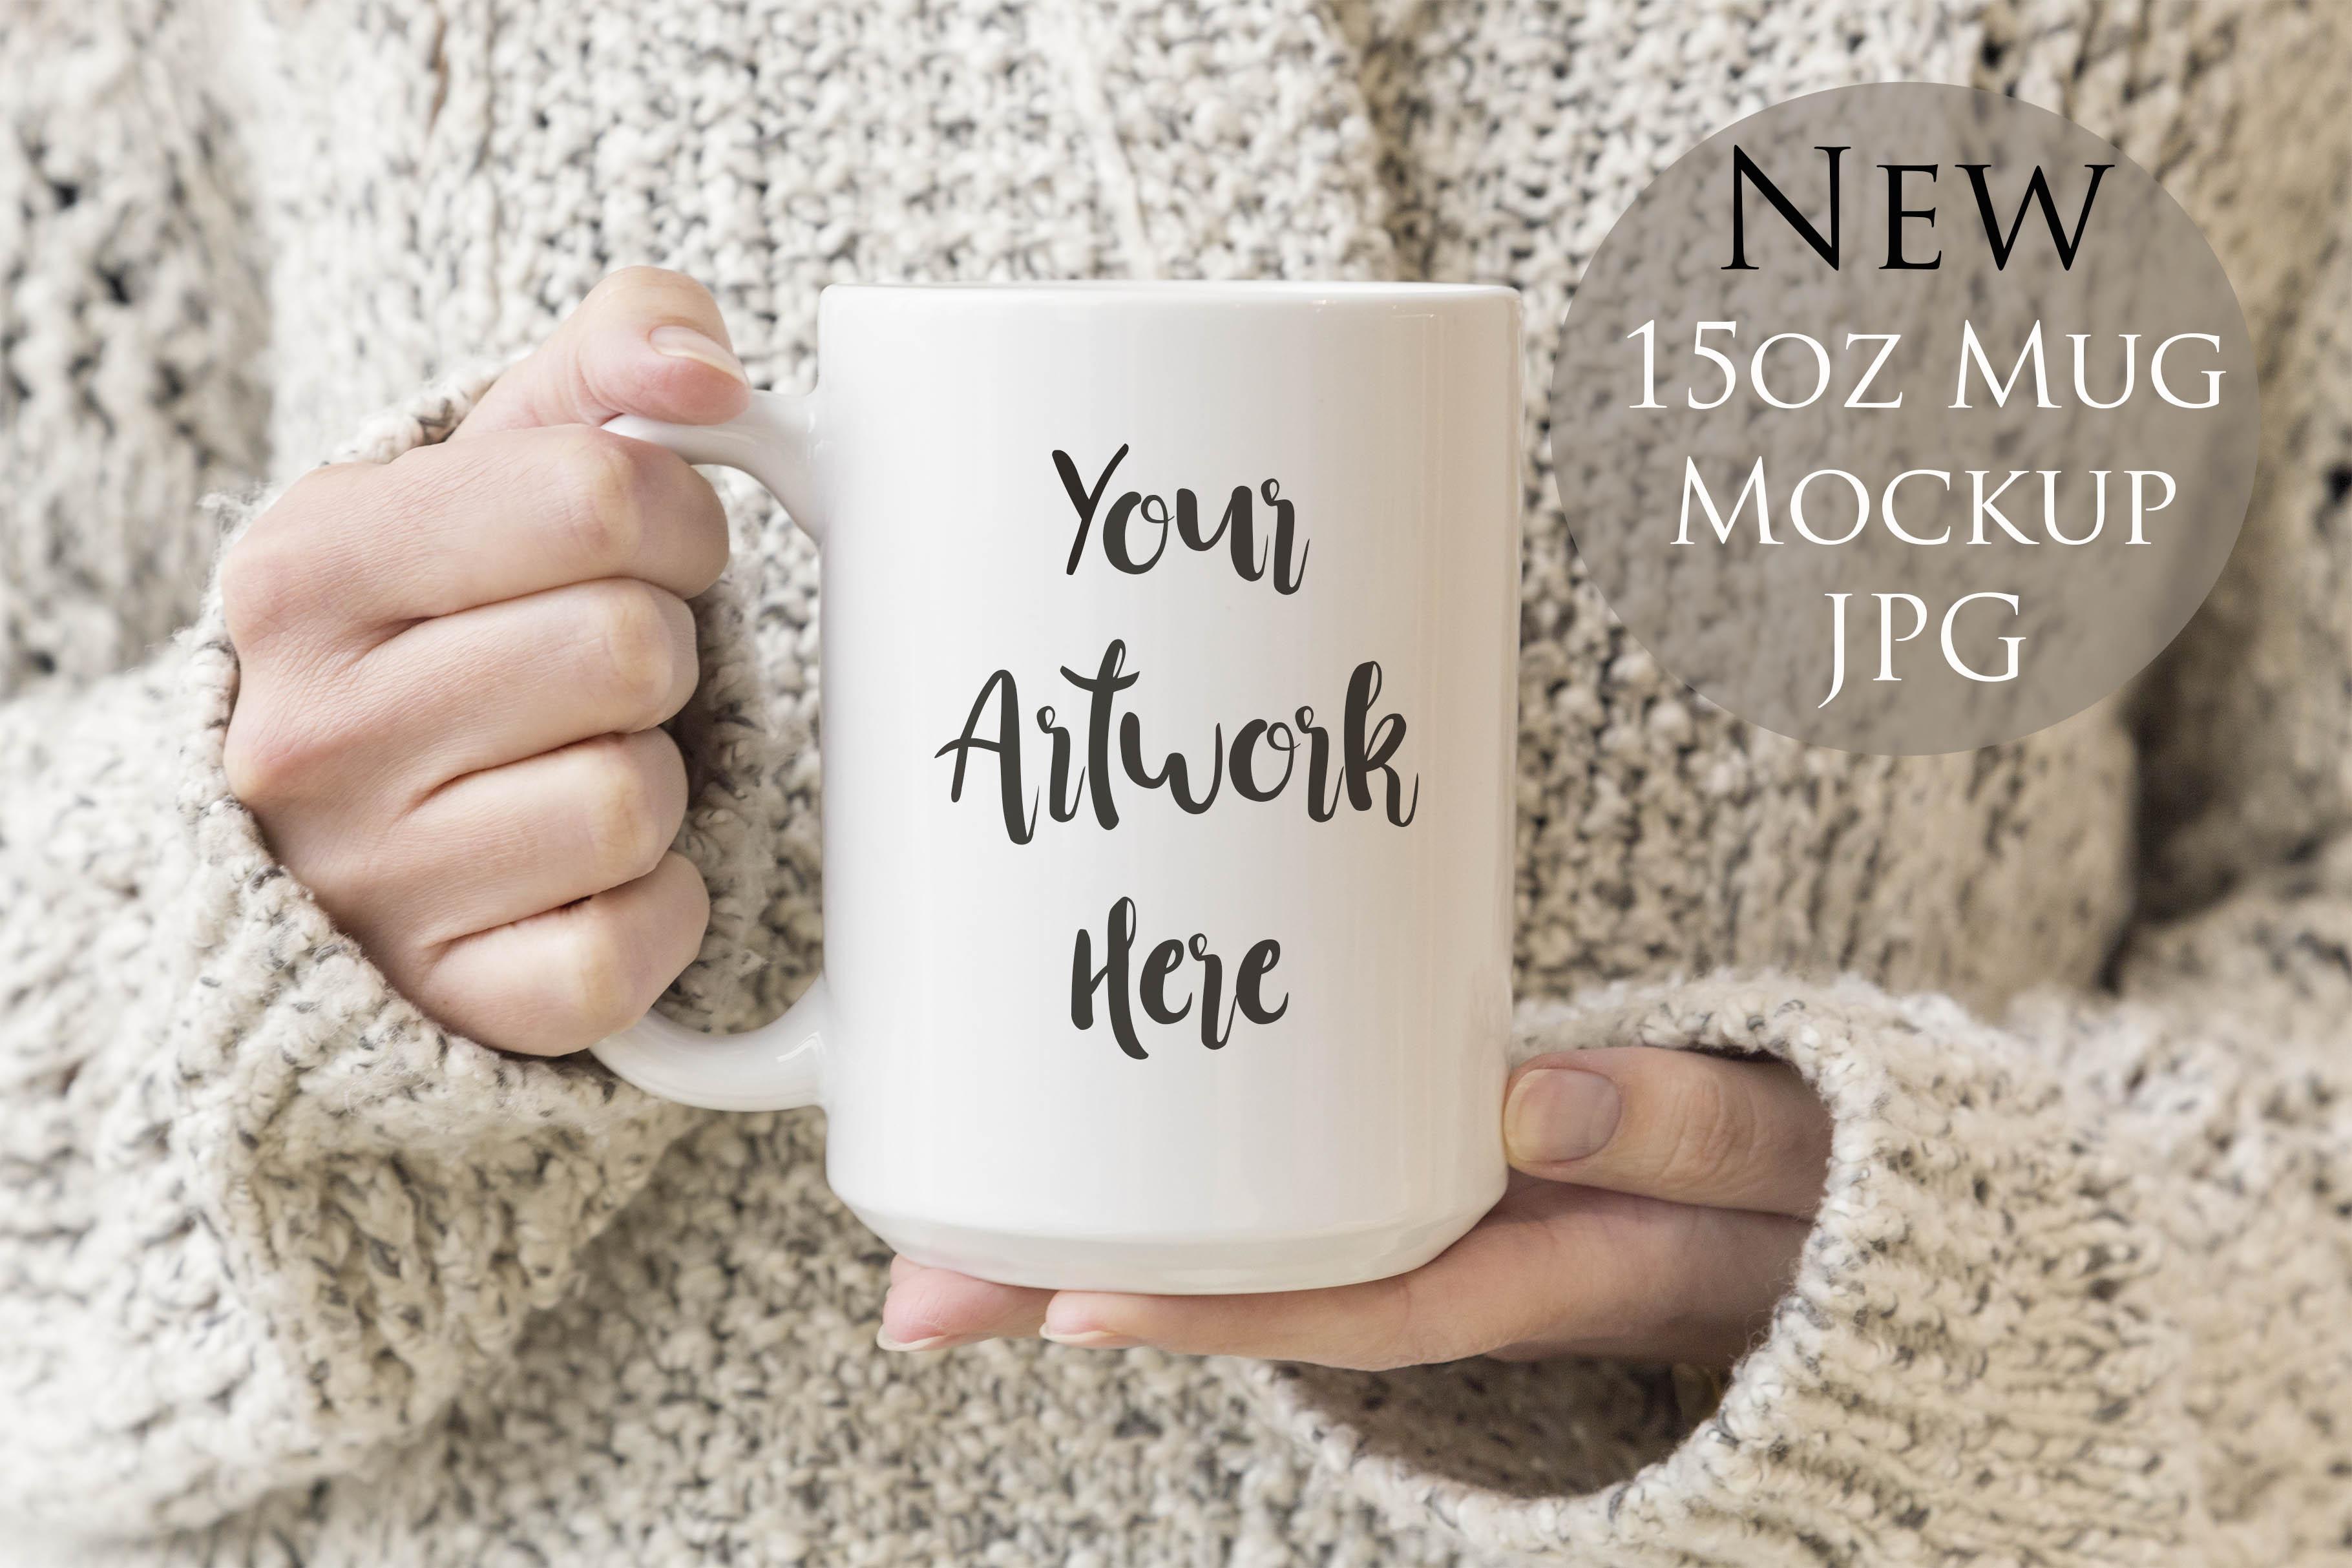 15oz Mug Mockup- Woman holding mug example image 1